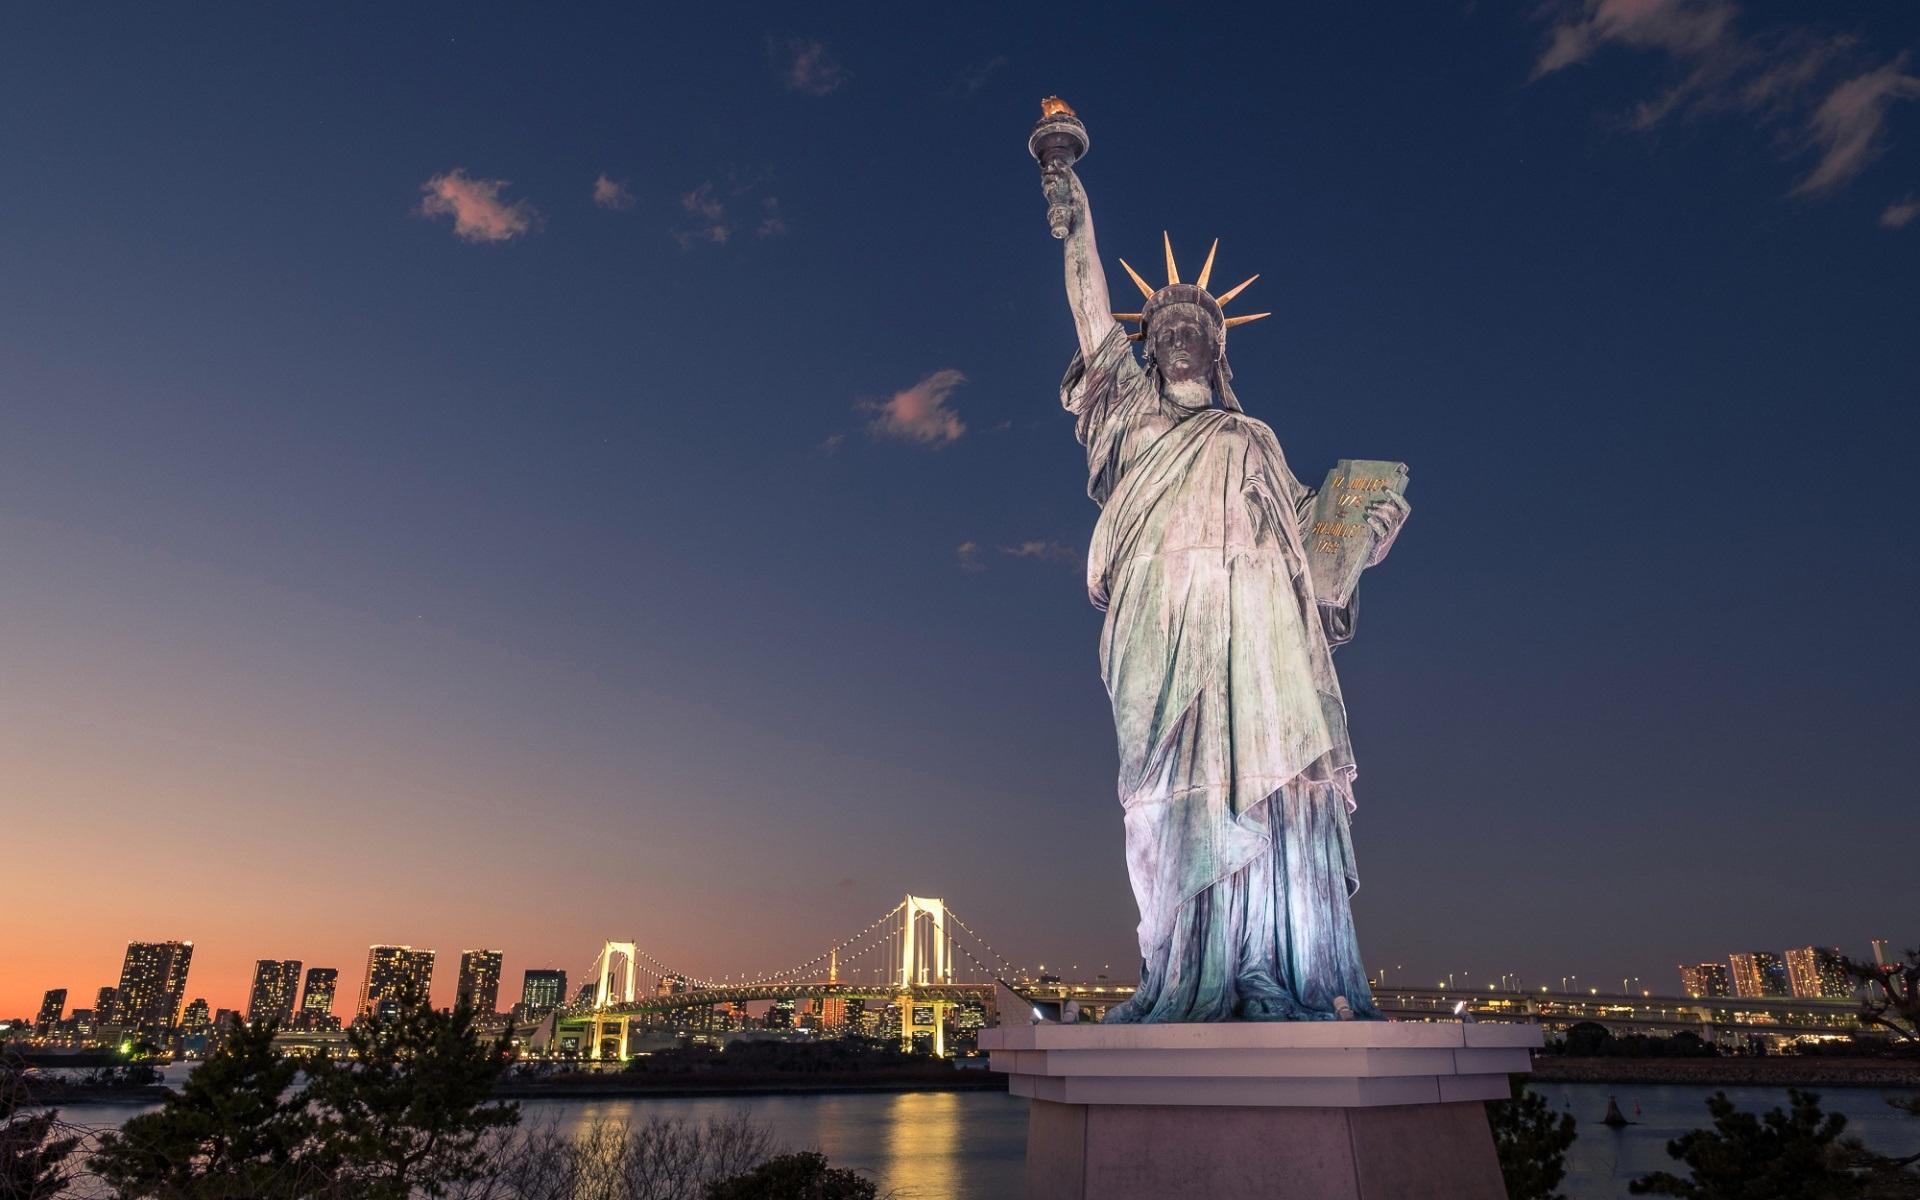 Wallpaper Odaiba Statue of Liberty Tokyo Japan 1920x1200 HD 1920x1200